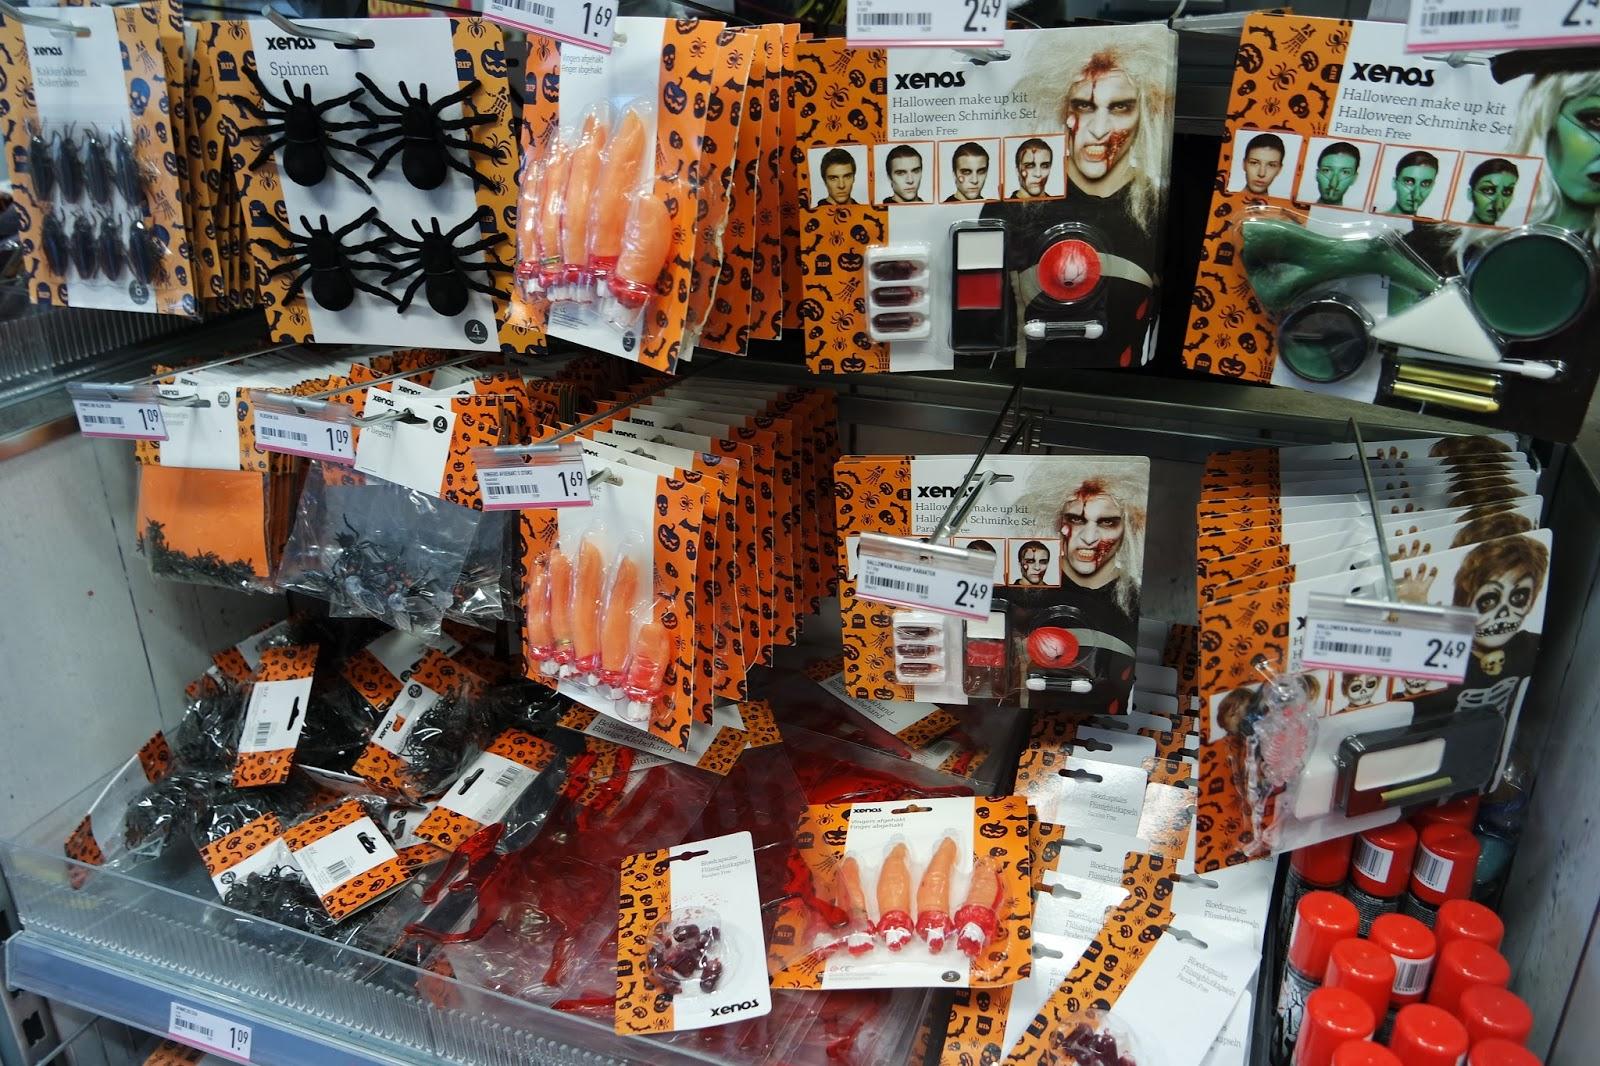 Xenos Halloween.Lifestyle Halloween In Nederland Miss Falicia